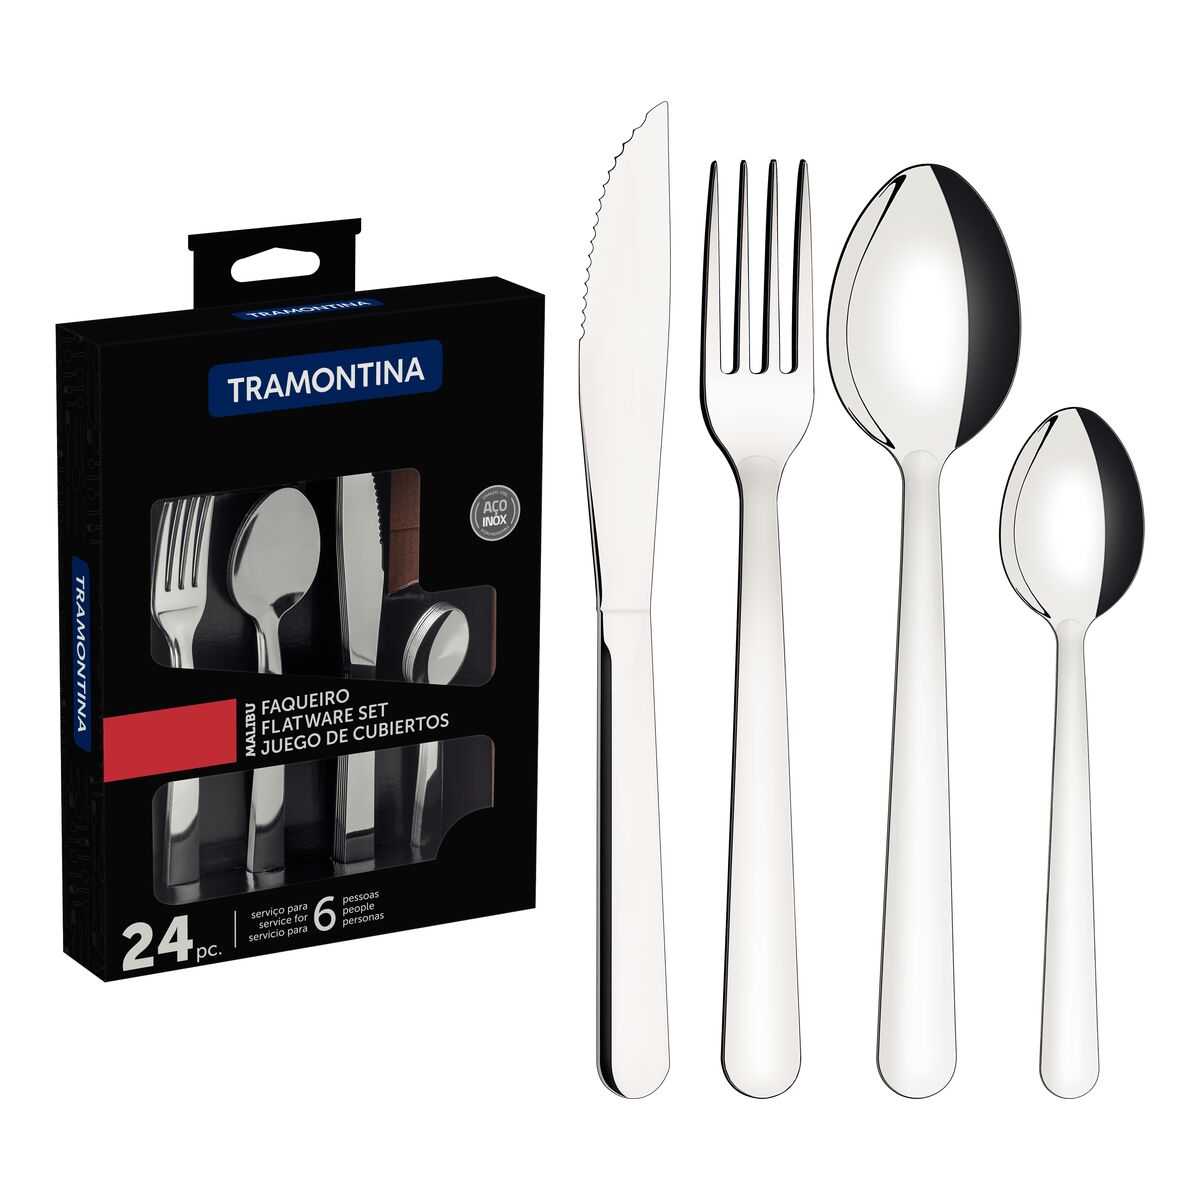 Tramontina Malibu smooth stainless steel flatware set, 24 pcs